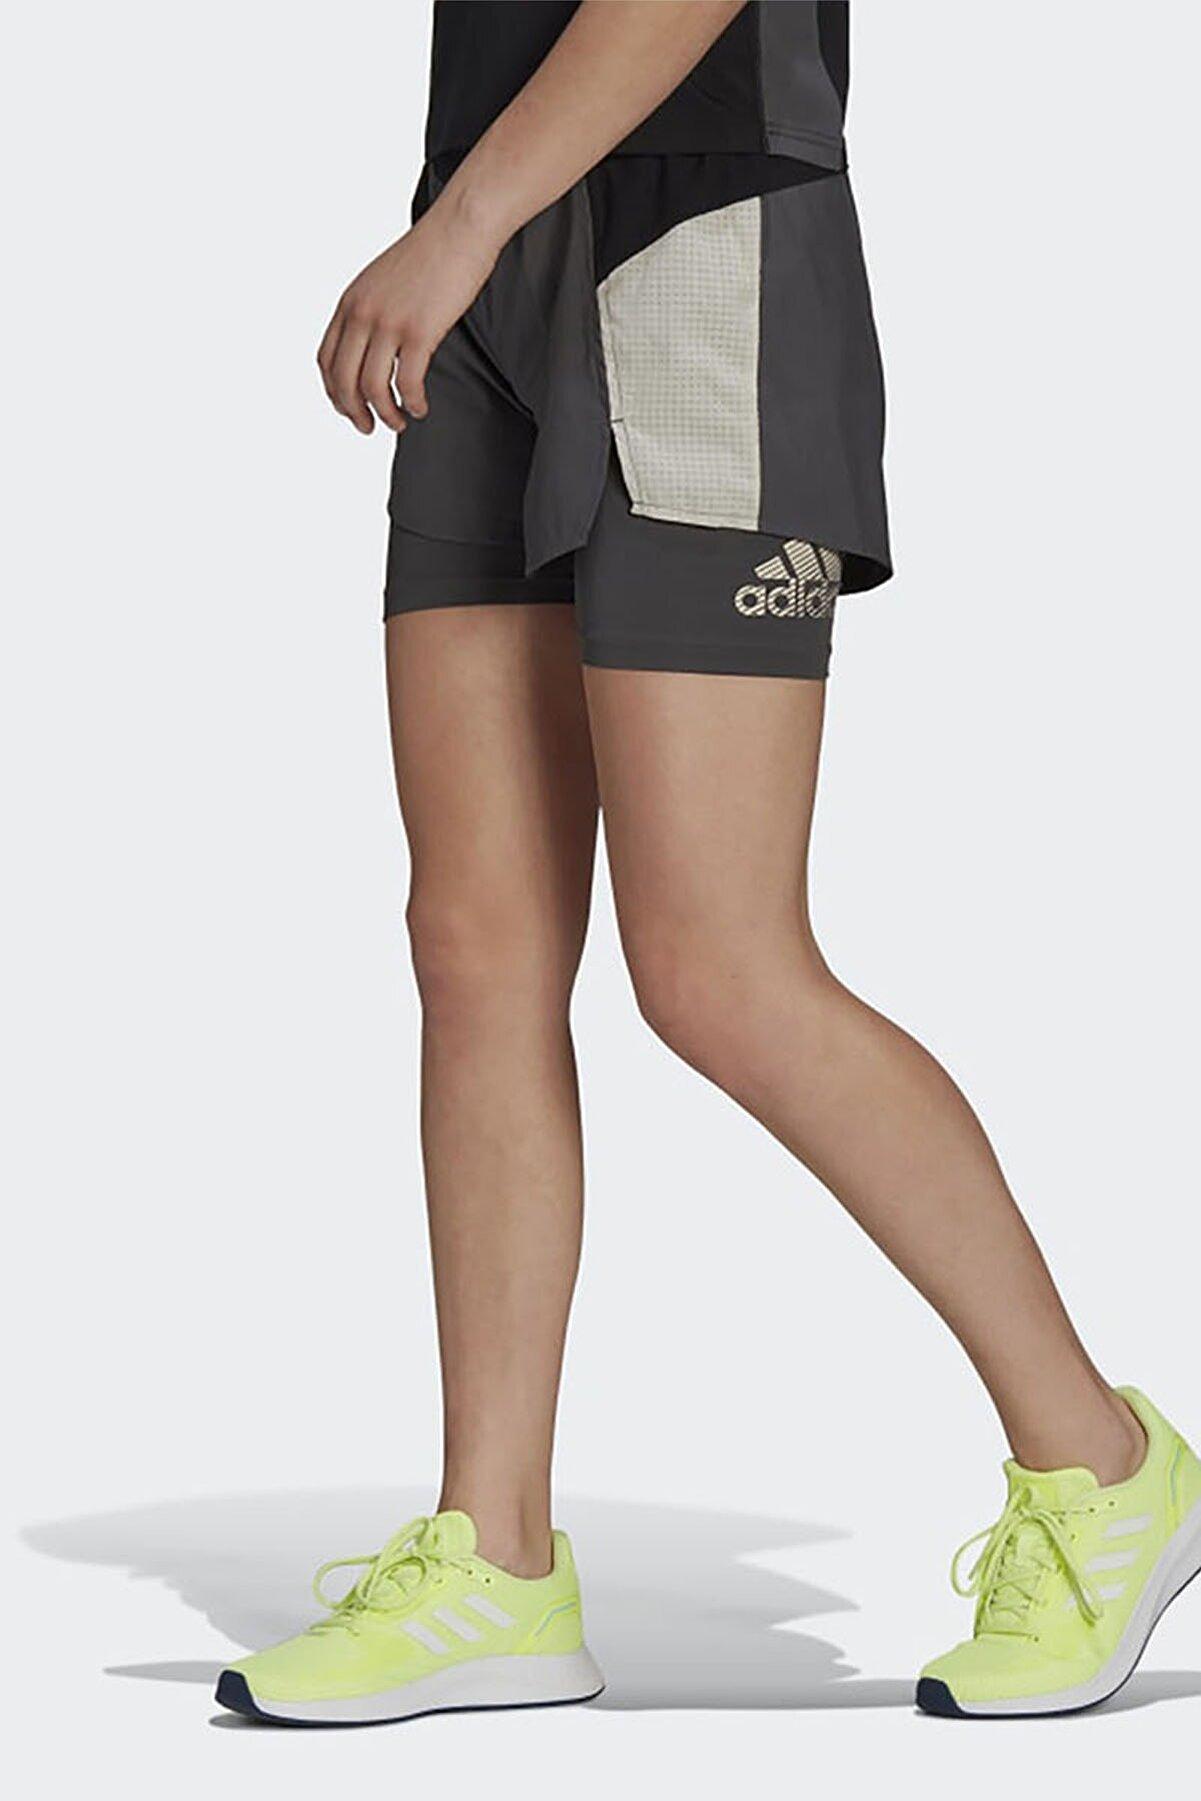 adidas Kadın Antrasit Koşu Yürüyüş Şort W At Sho Gl4012